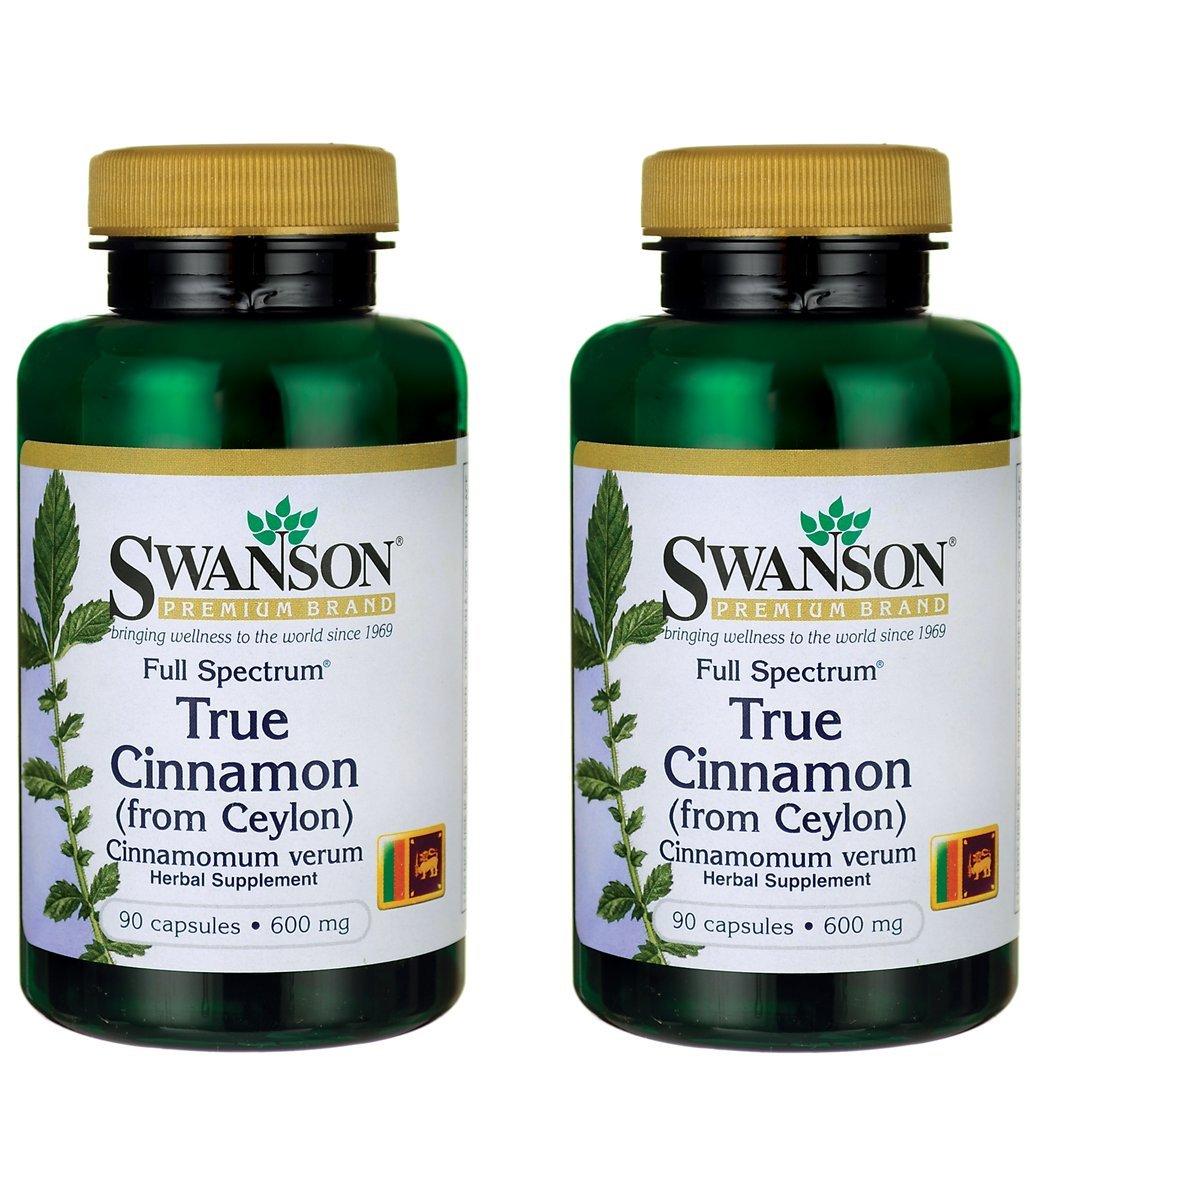 Cinnabalance Liquid Cinnamon Supplement w Cinnamon Bark, Aloe Vera, Ginger Root, Green Tea Antioxidants – Promotes healthy blood sugar support glucose levels – 32 oz, 32 servings